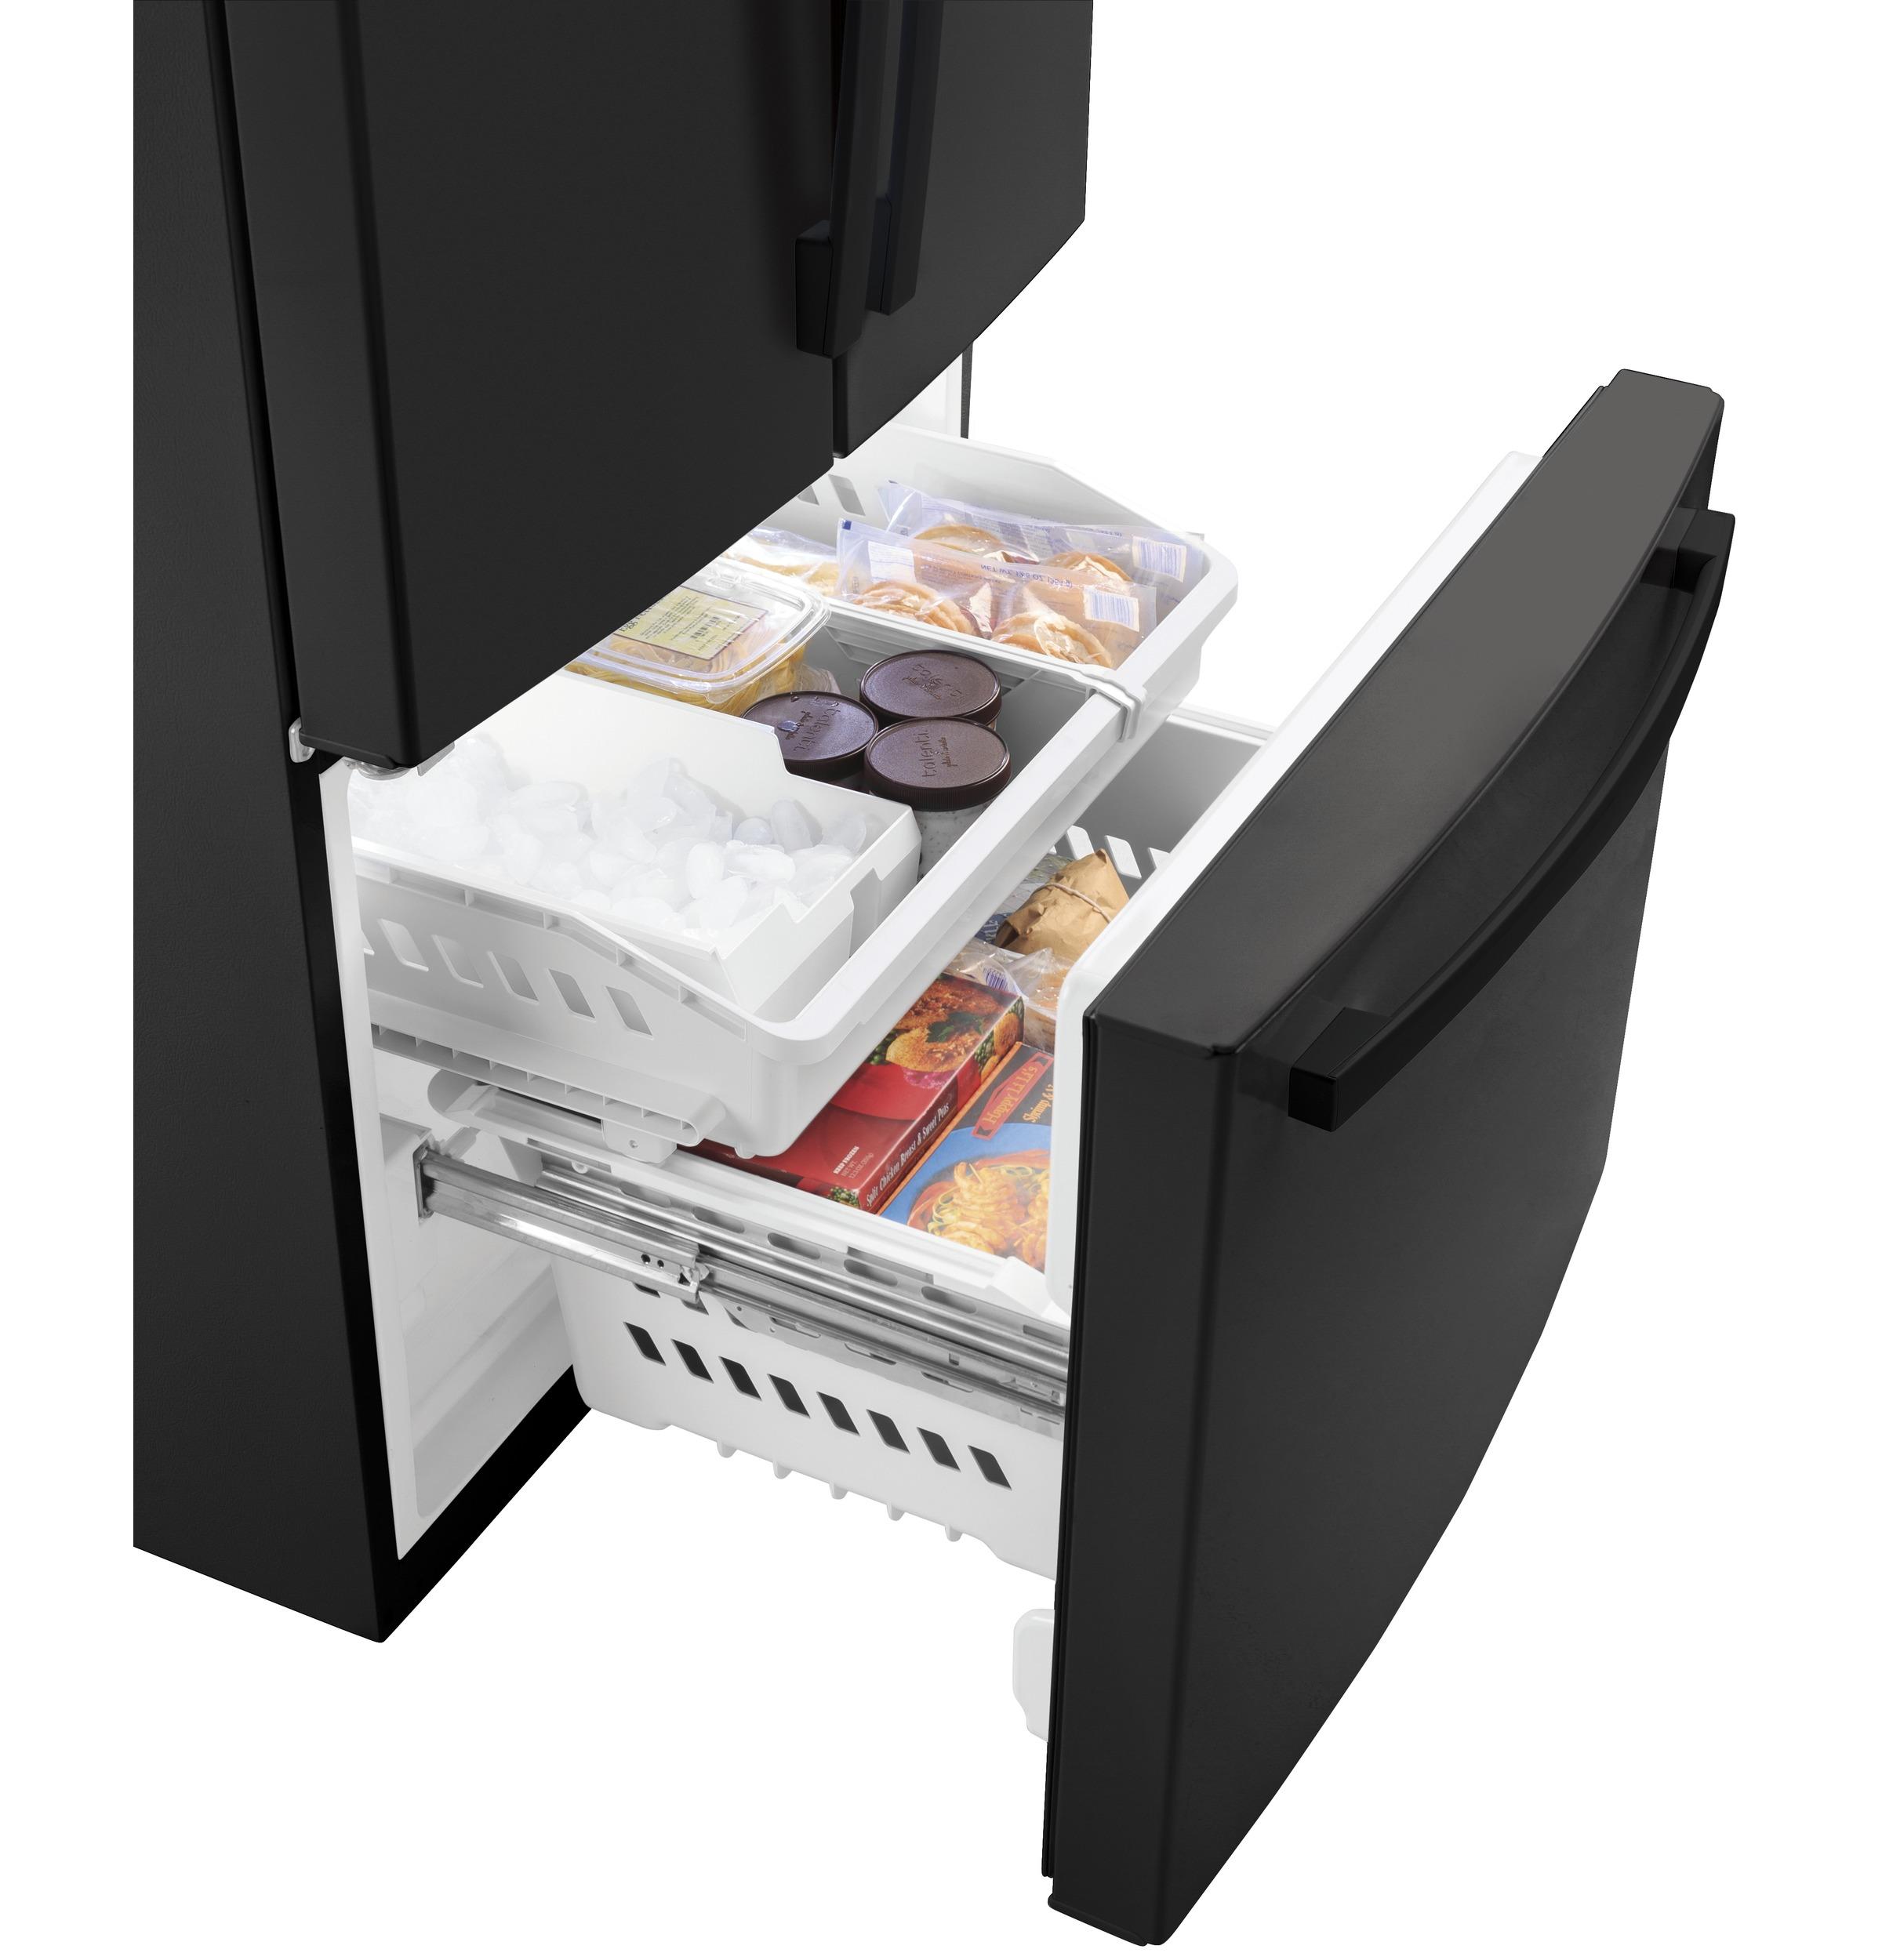 Model: GNE27JGMBB   GE GE® ENERGY STAR® 27.0 Cu. Ft. French-Door Refrigerator